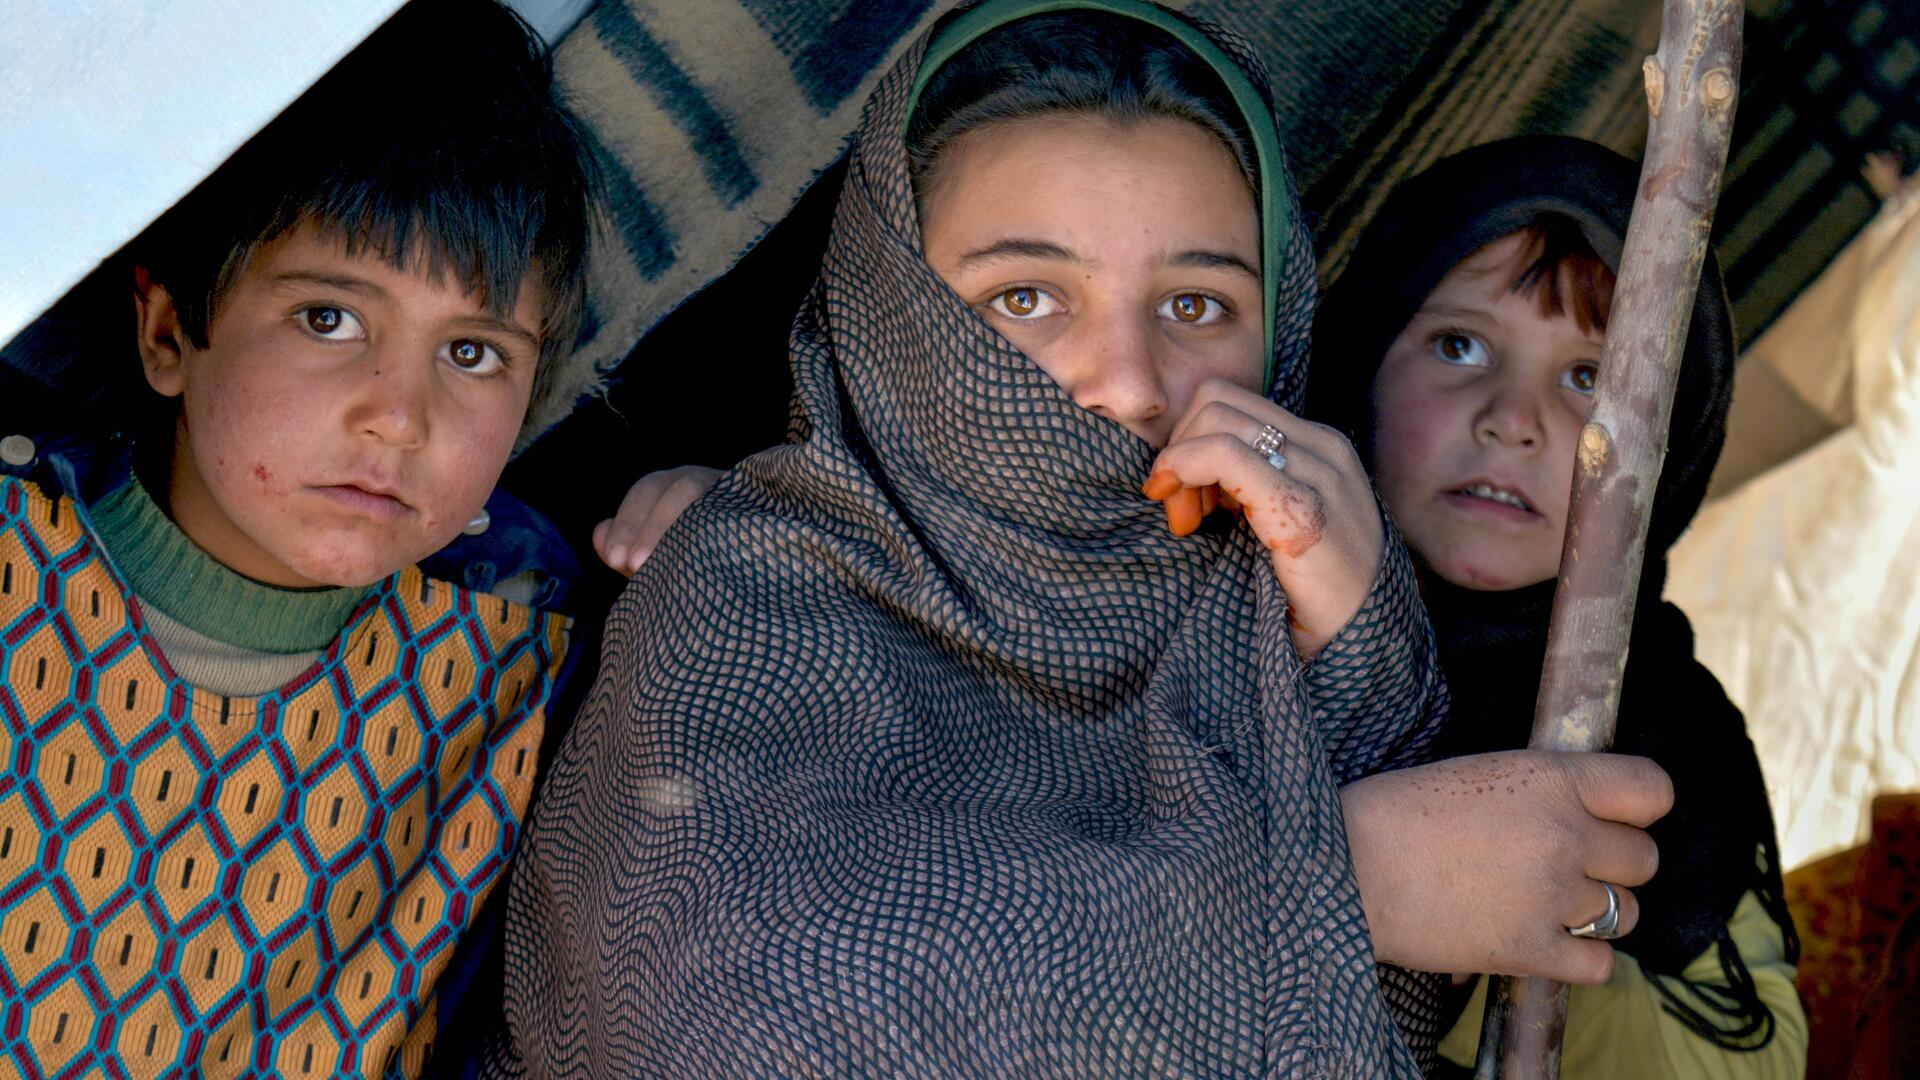 Three Afghan children sit inside a makeshift tent